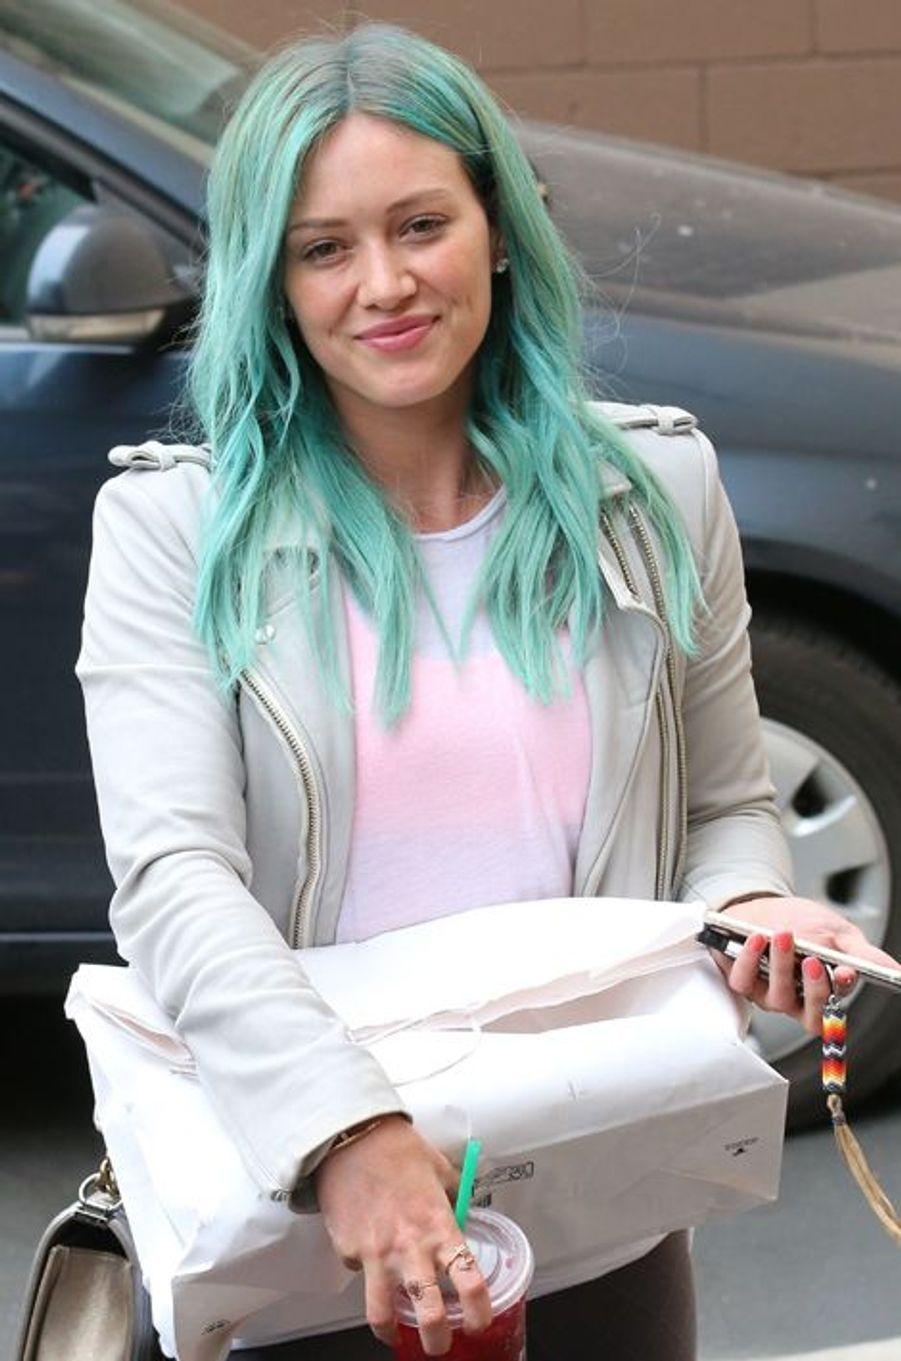 La chanteuse Hilary Duff